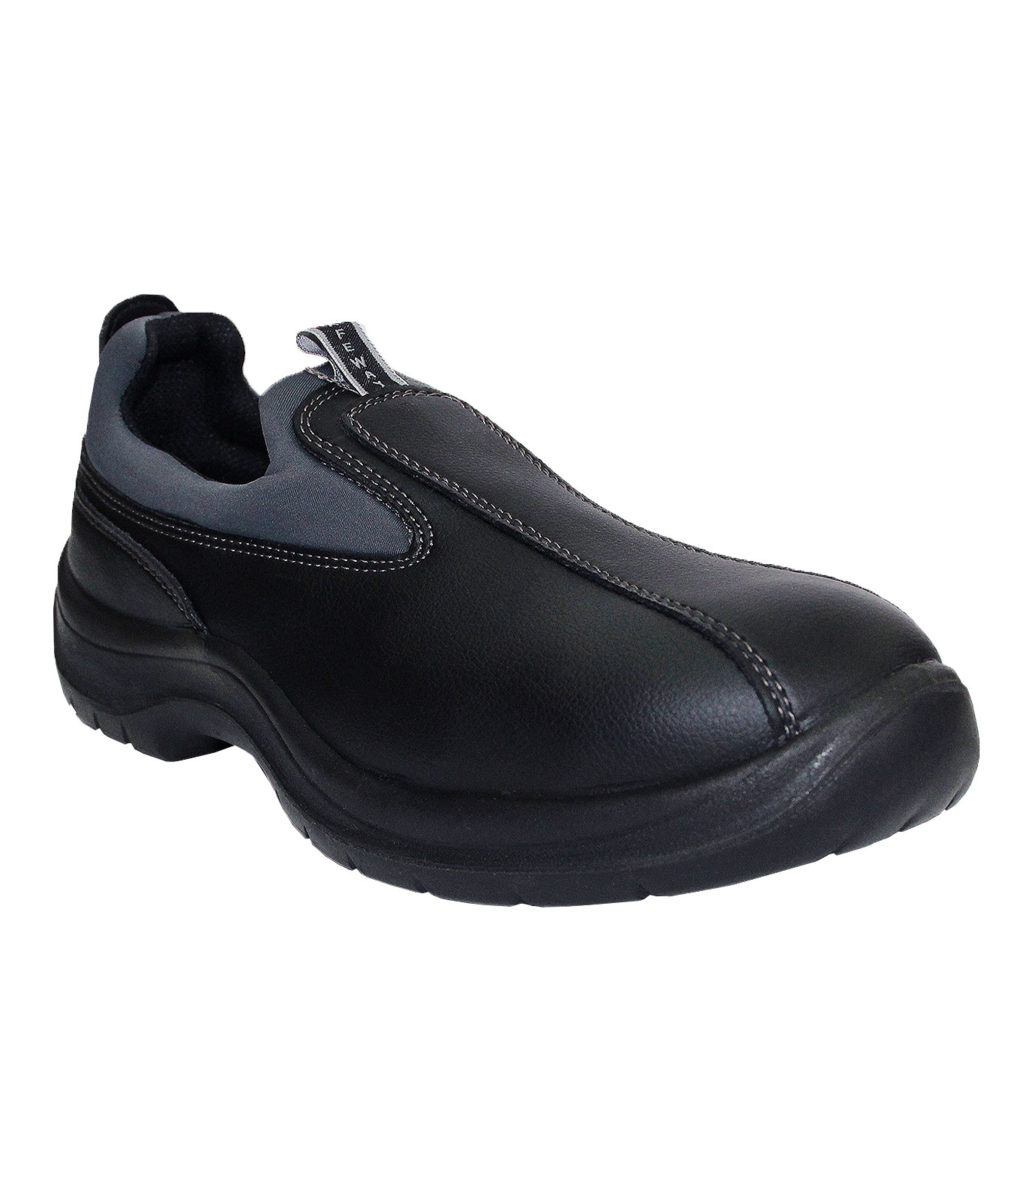 MALIBU παπούτσι εργασίας